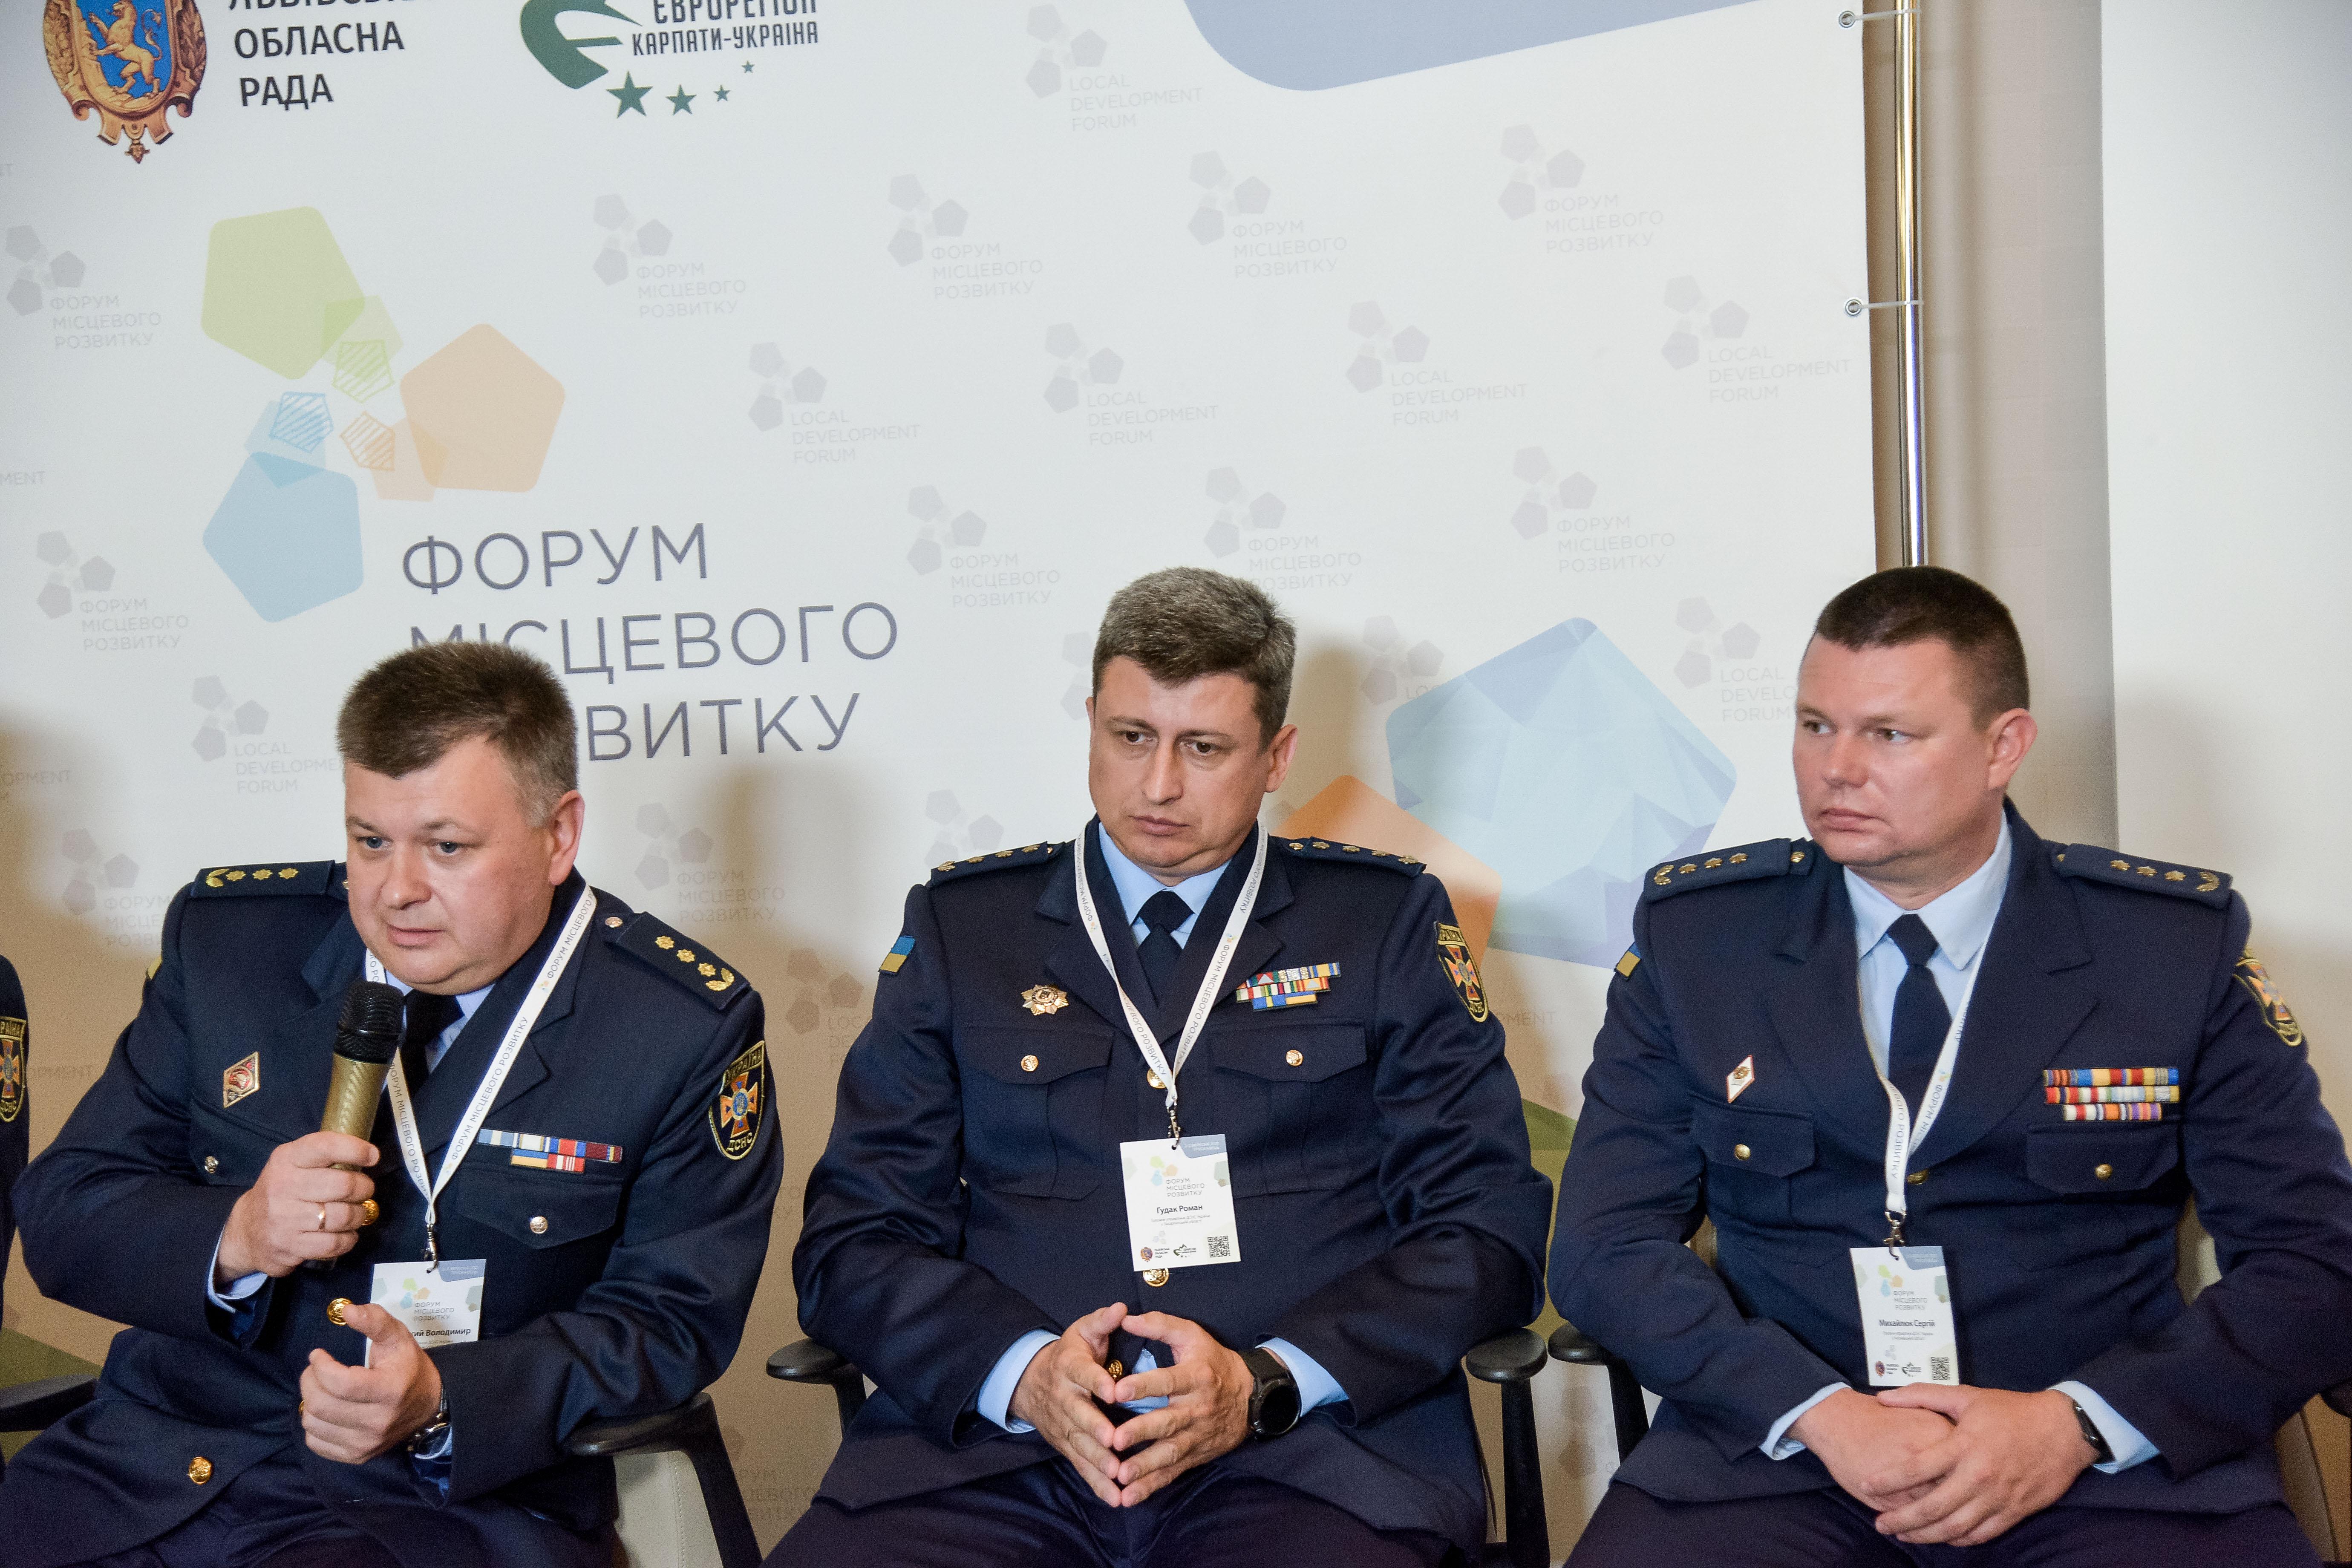 forum-rozvytku-Truskavets-2021-09-03_09903_HBR_LUFA-010.jpg